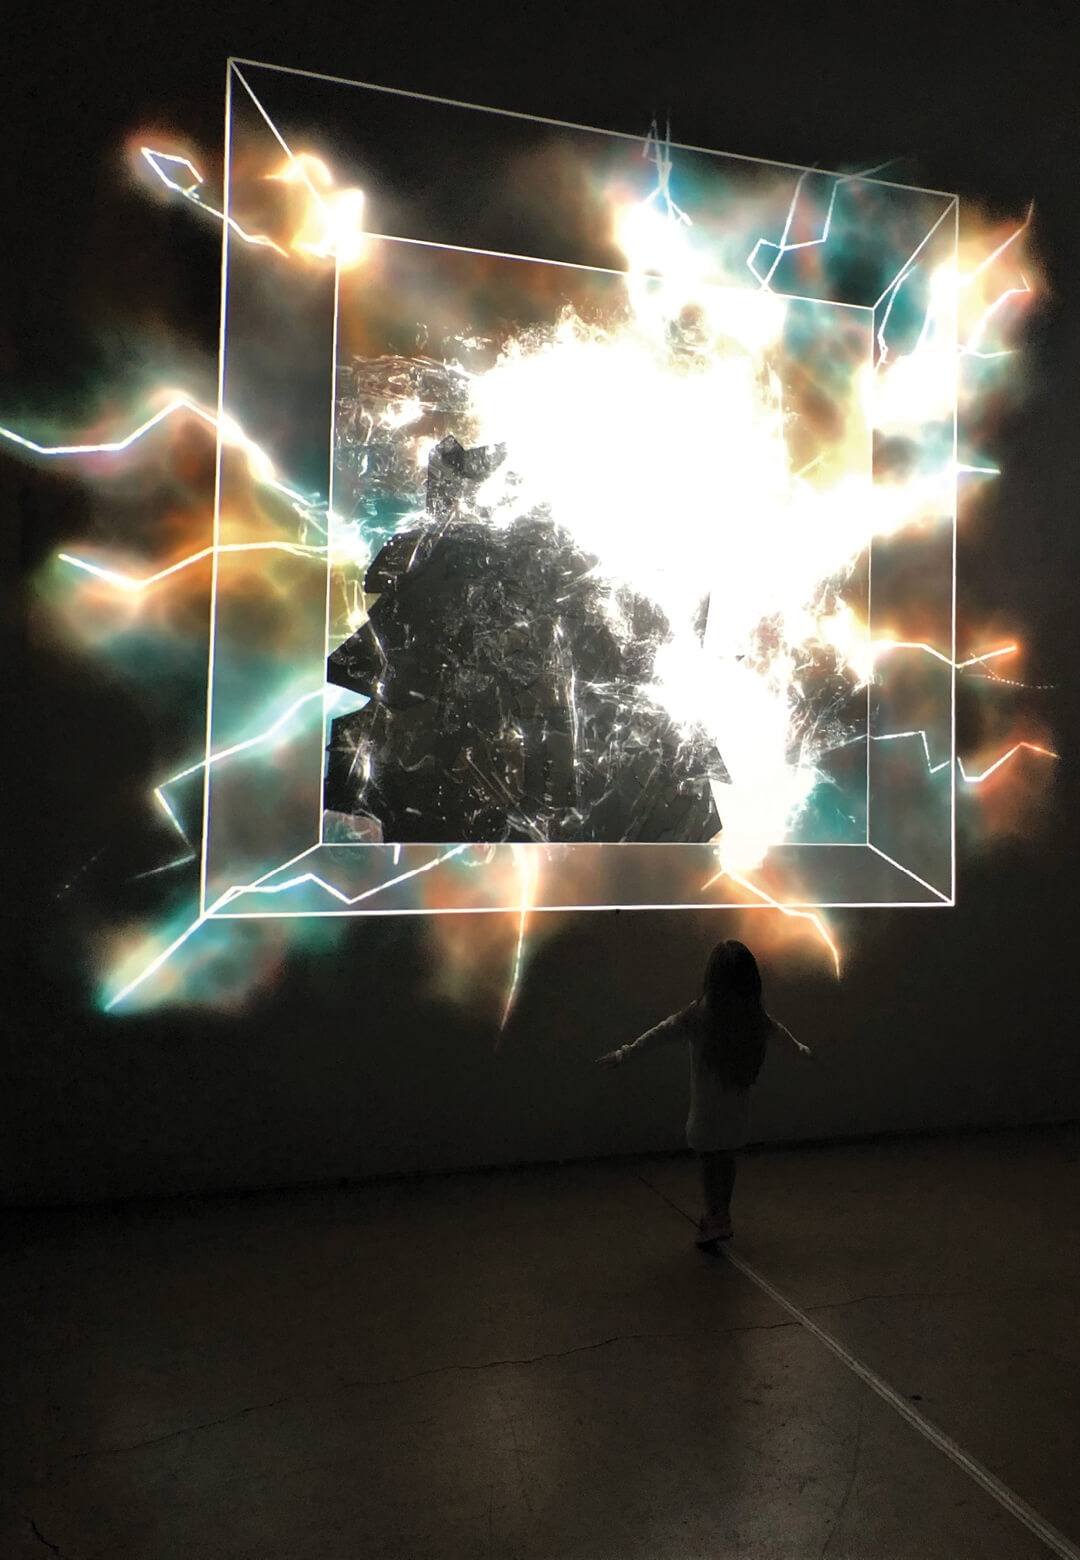 A glimpse of Bolton's interactive installation titled Potential Energy | Radii | Brett Bolton | STIRworld